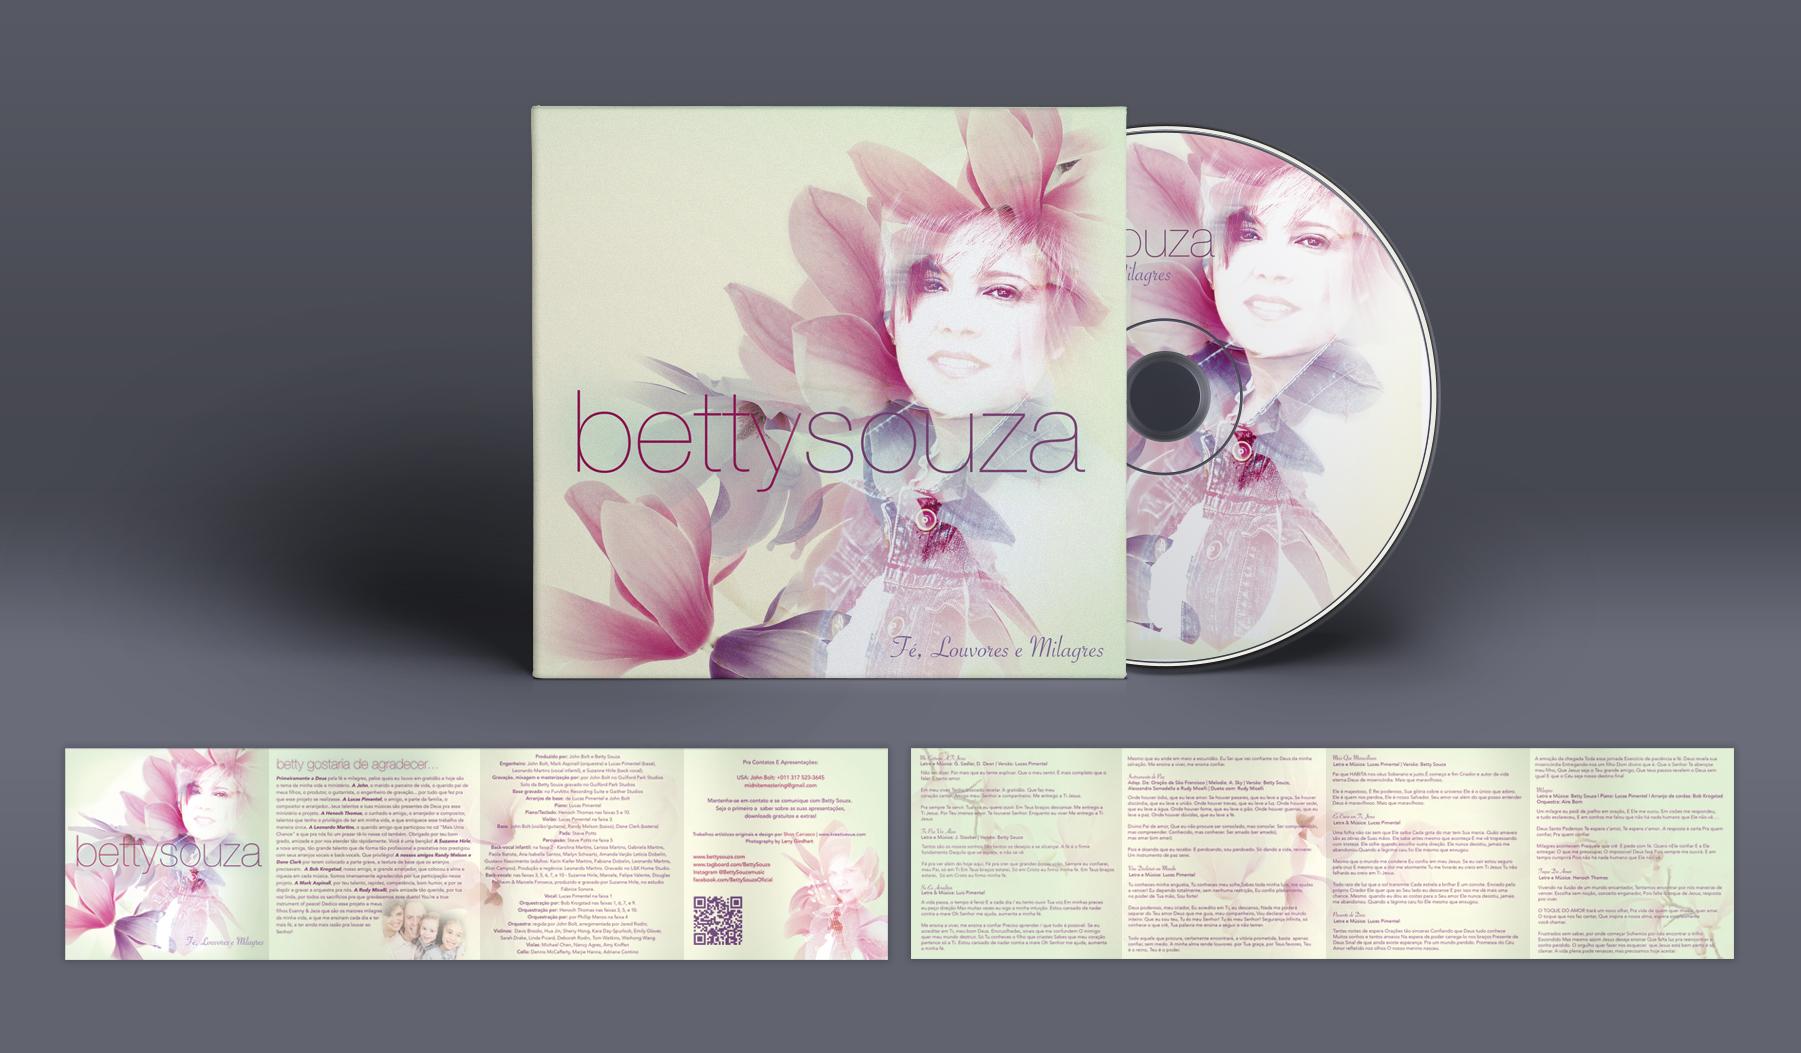 BettySouza_CD_Mockup.jpg